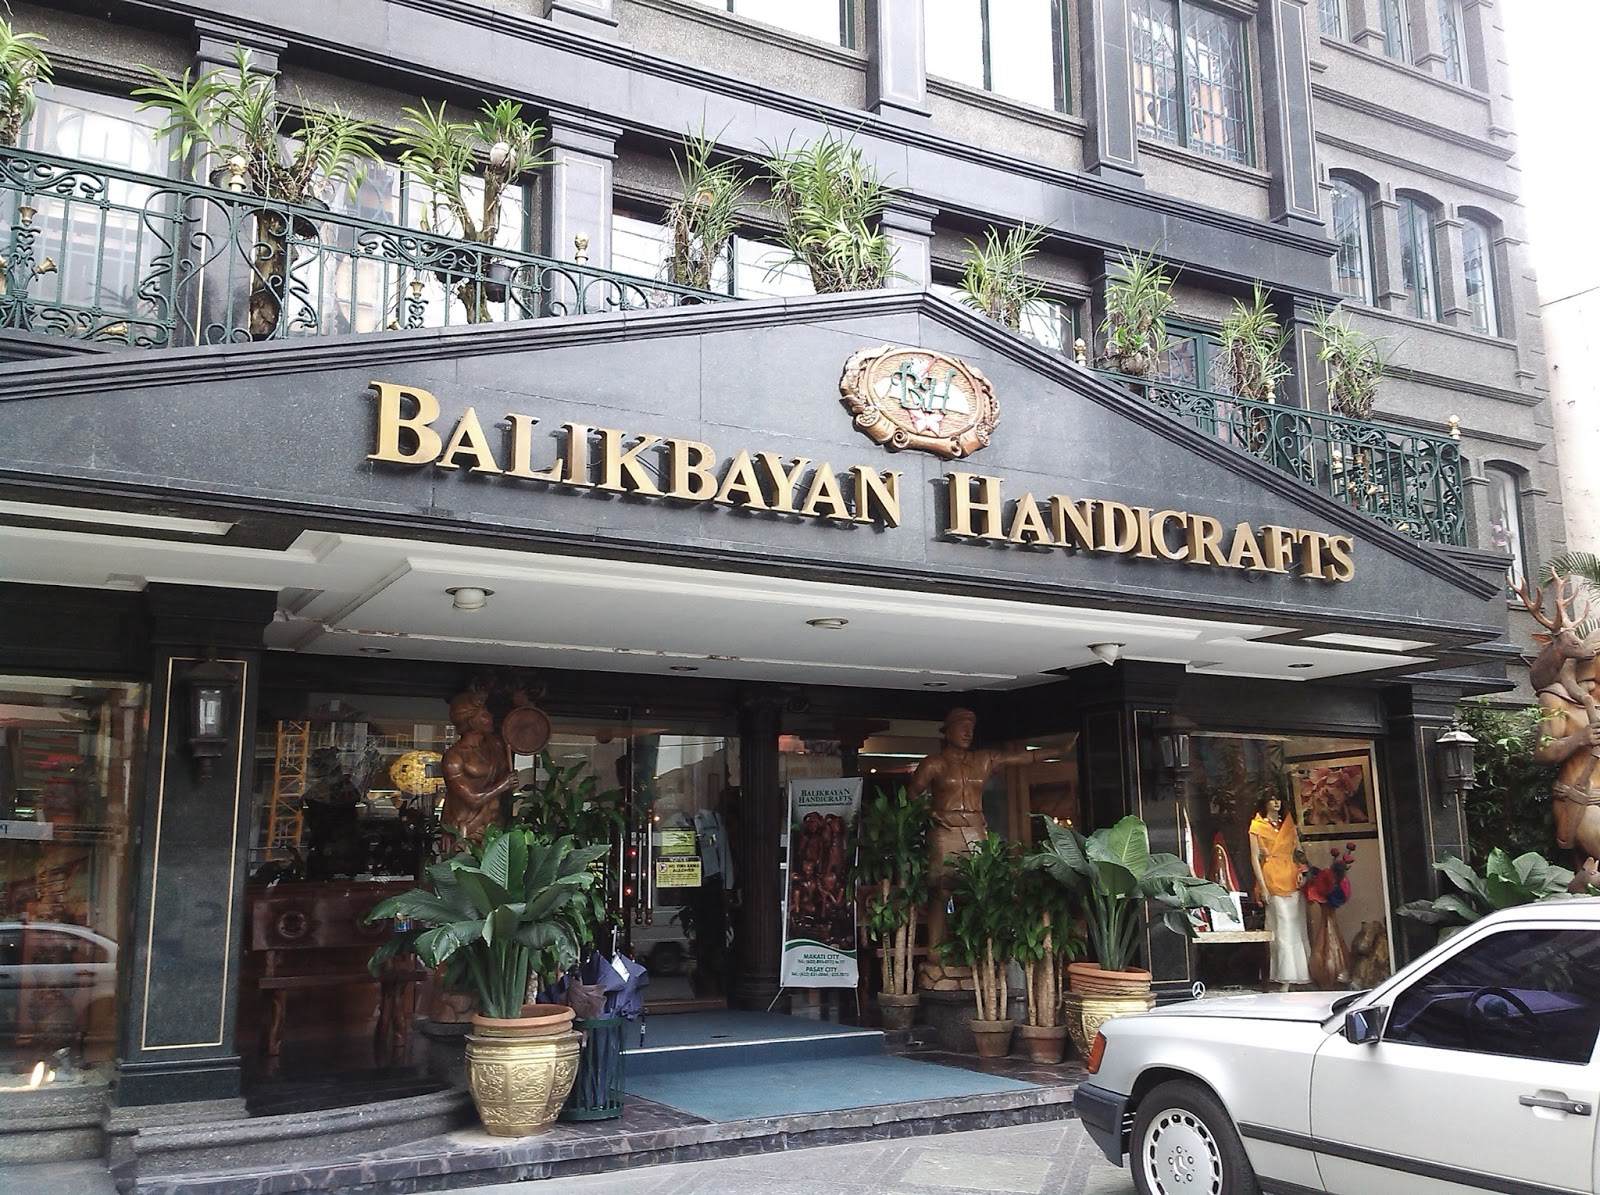 The Rich St Deli Always In Action Balikbayan Handicrafts